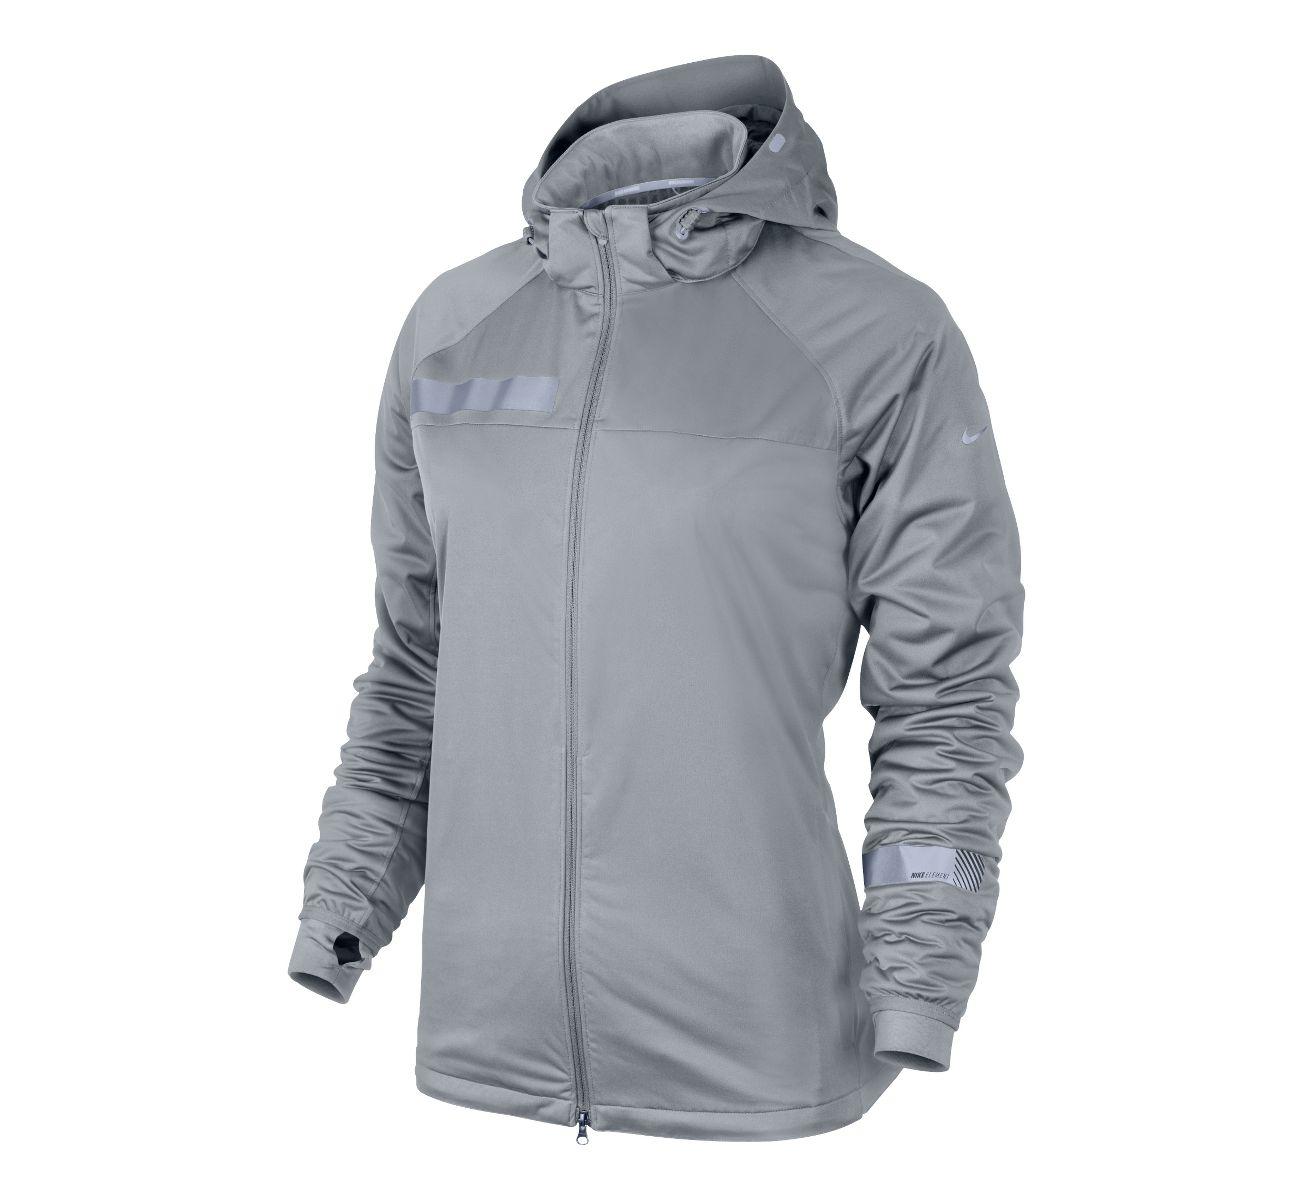 Nike element jacket men's - Nike Shield Jacket Clothing Shoes Accessories